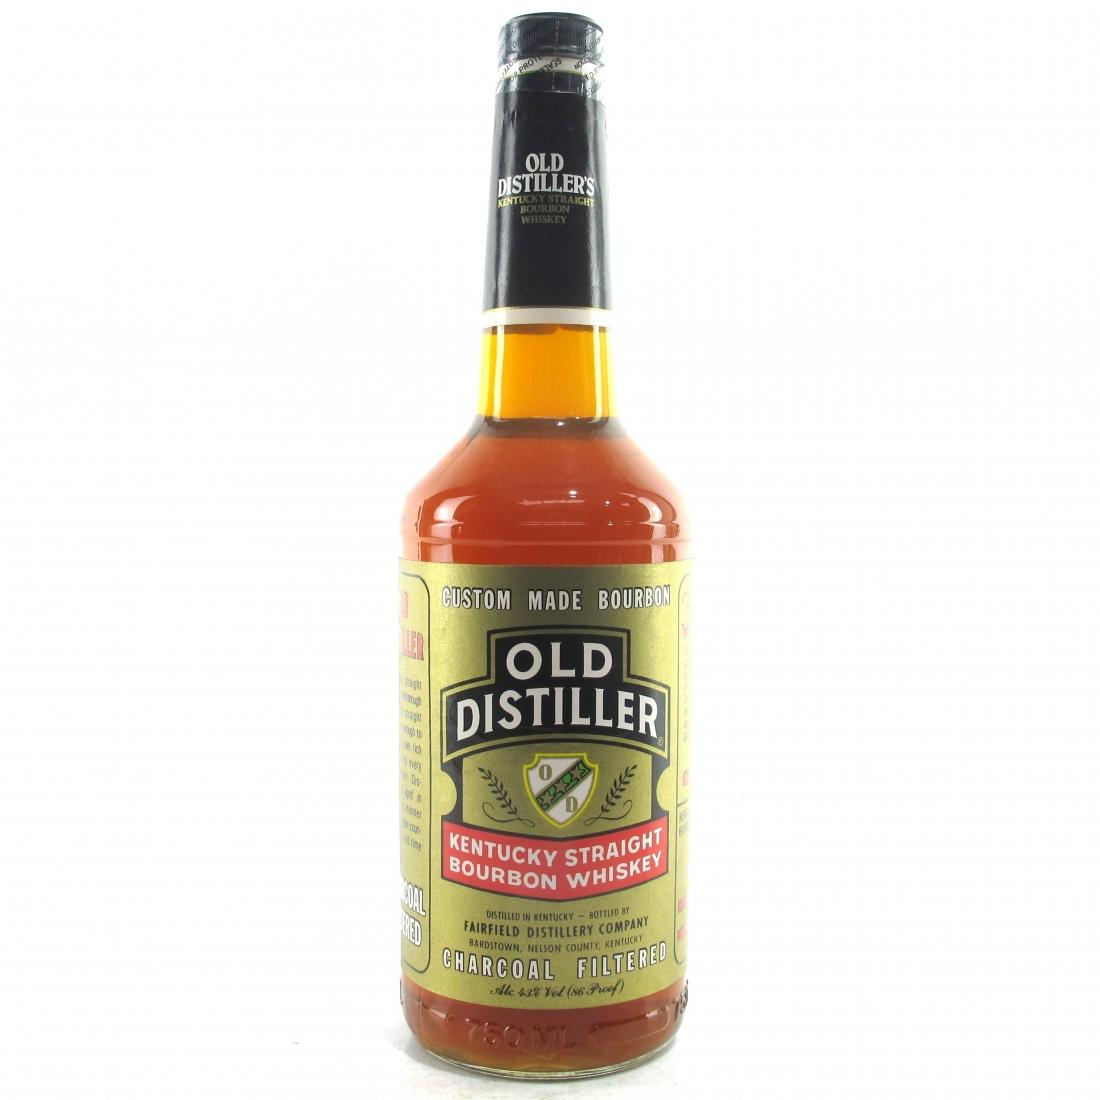 Old Distiller Kentucky Straight Bourbon 1990s